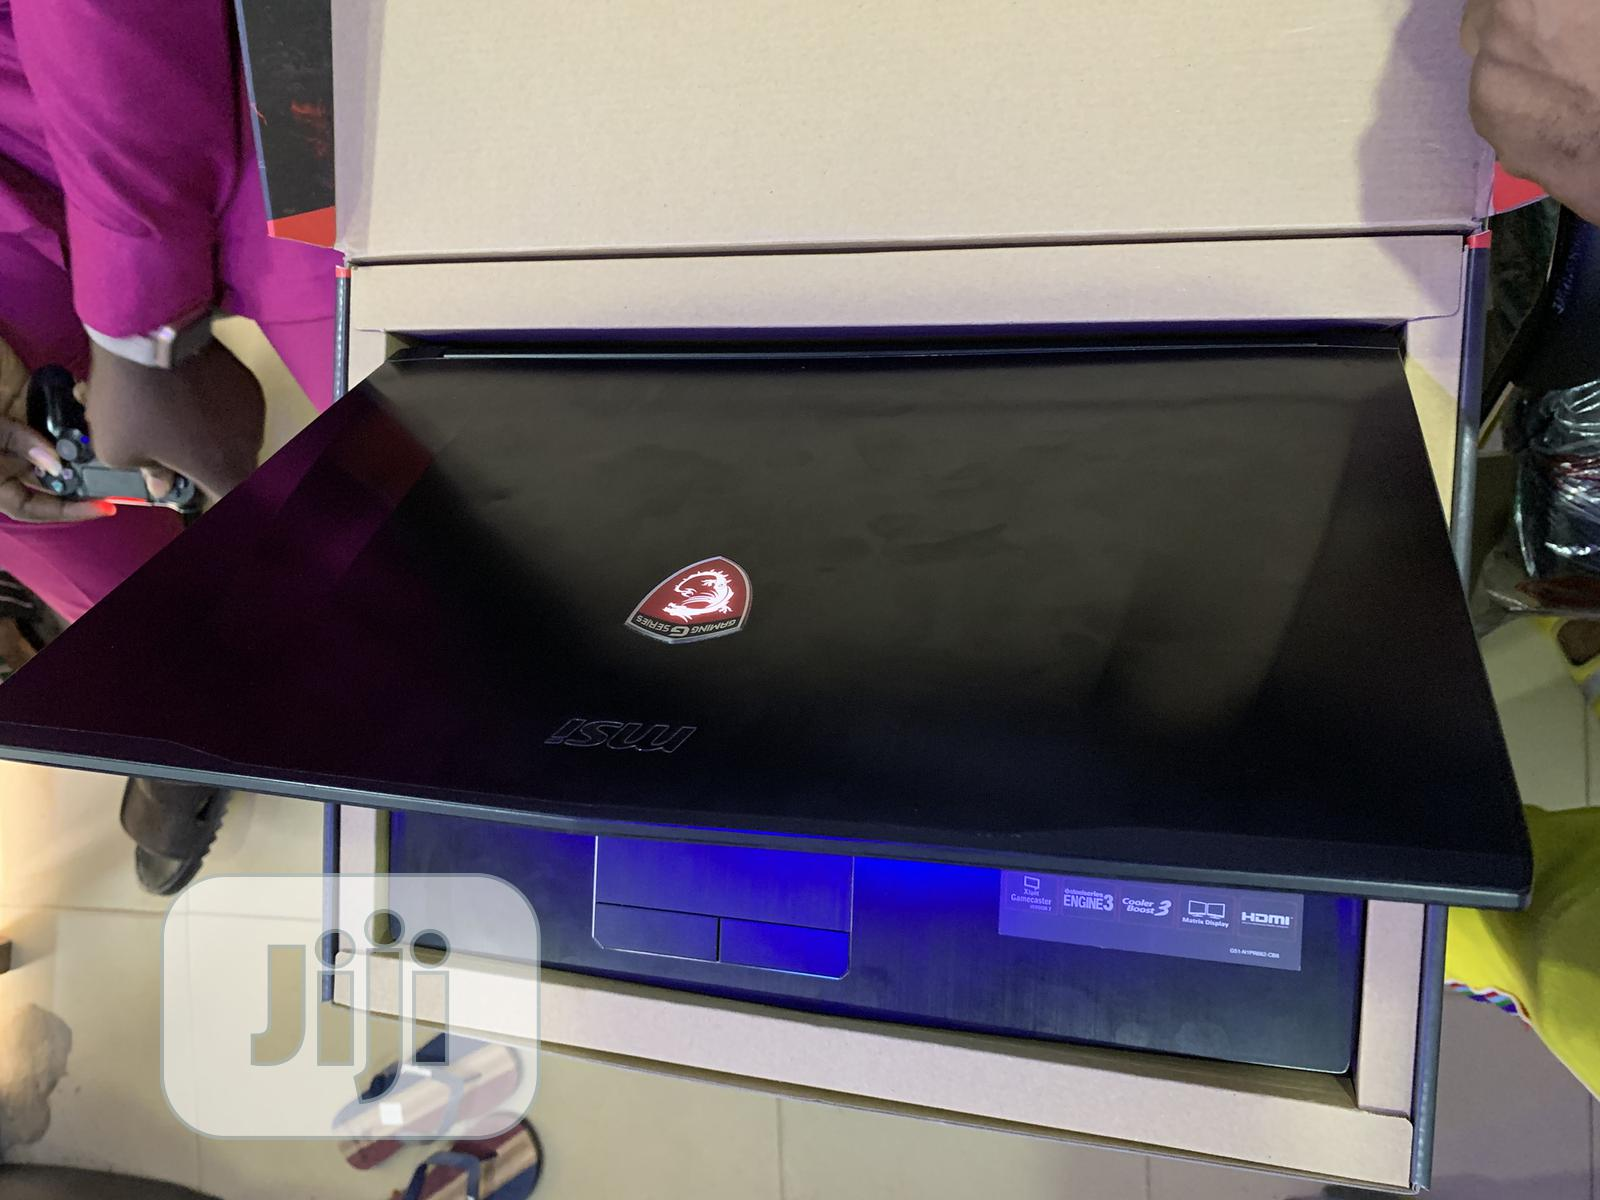 New Laptop MSI GE62 2QF Apache Pro 16GB Intel Core I7 SSHD (Hybrid) 1T | Laptops & Computers for sale in Benin City, Edo State, Nigeria